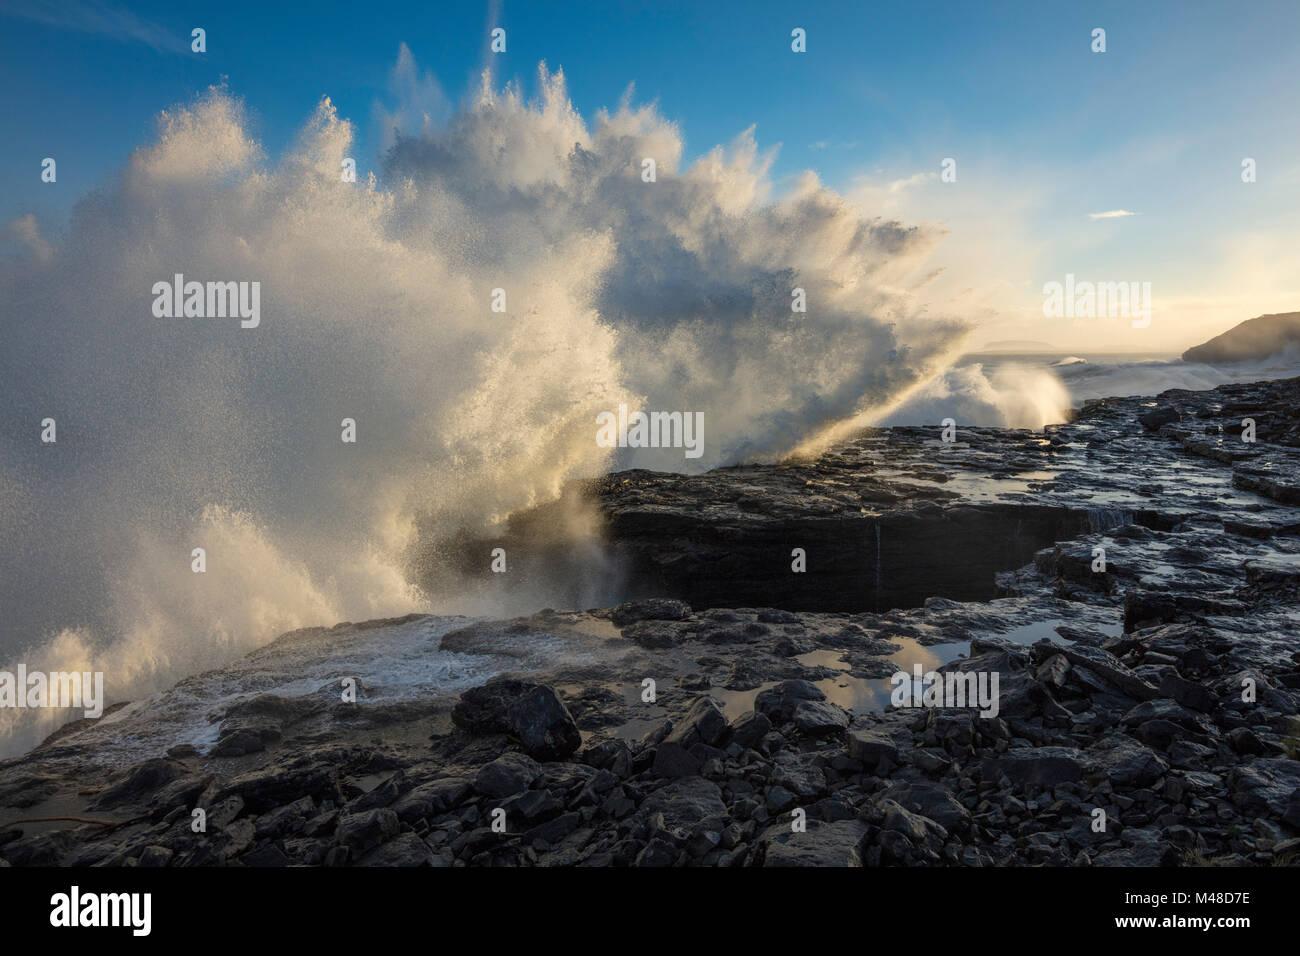 Wellen brechen am Strand von Easky, County Sligo, Irland. Stockbild